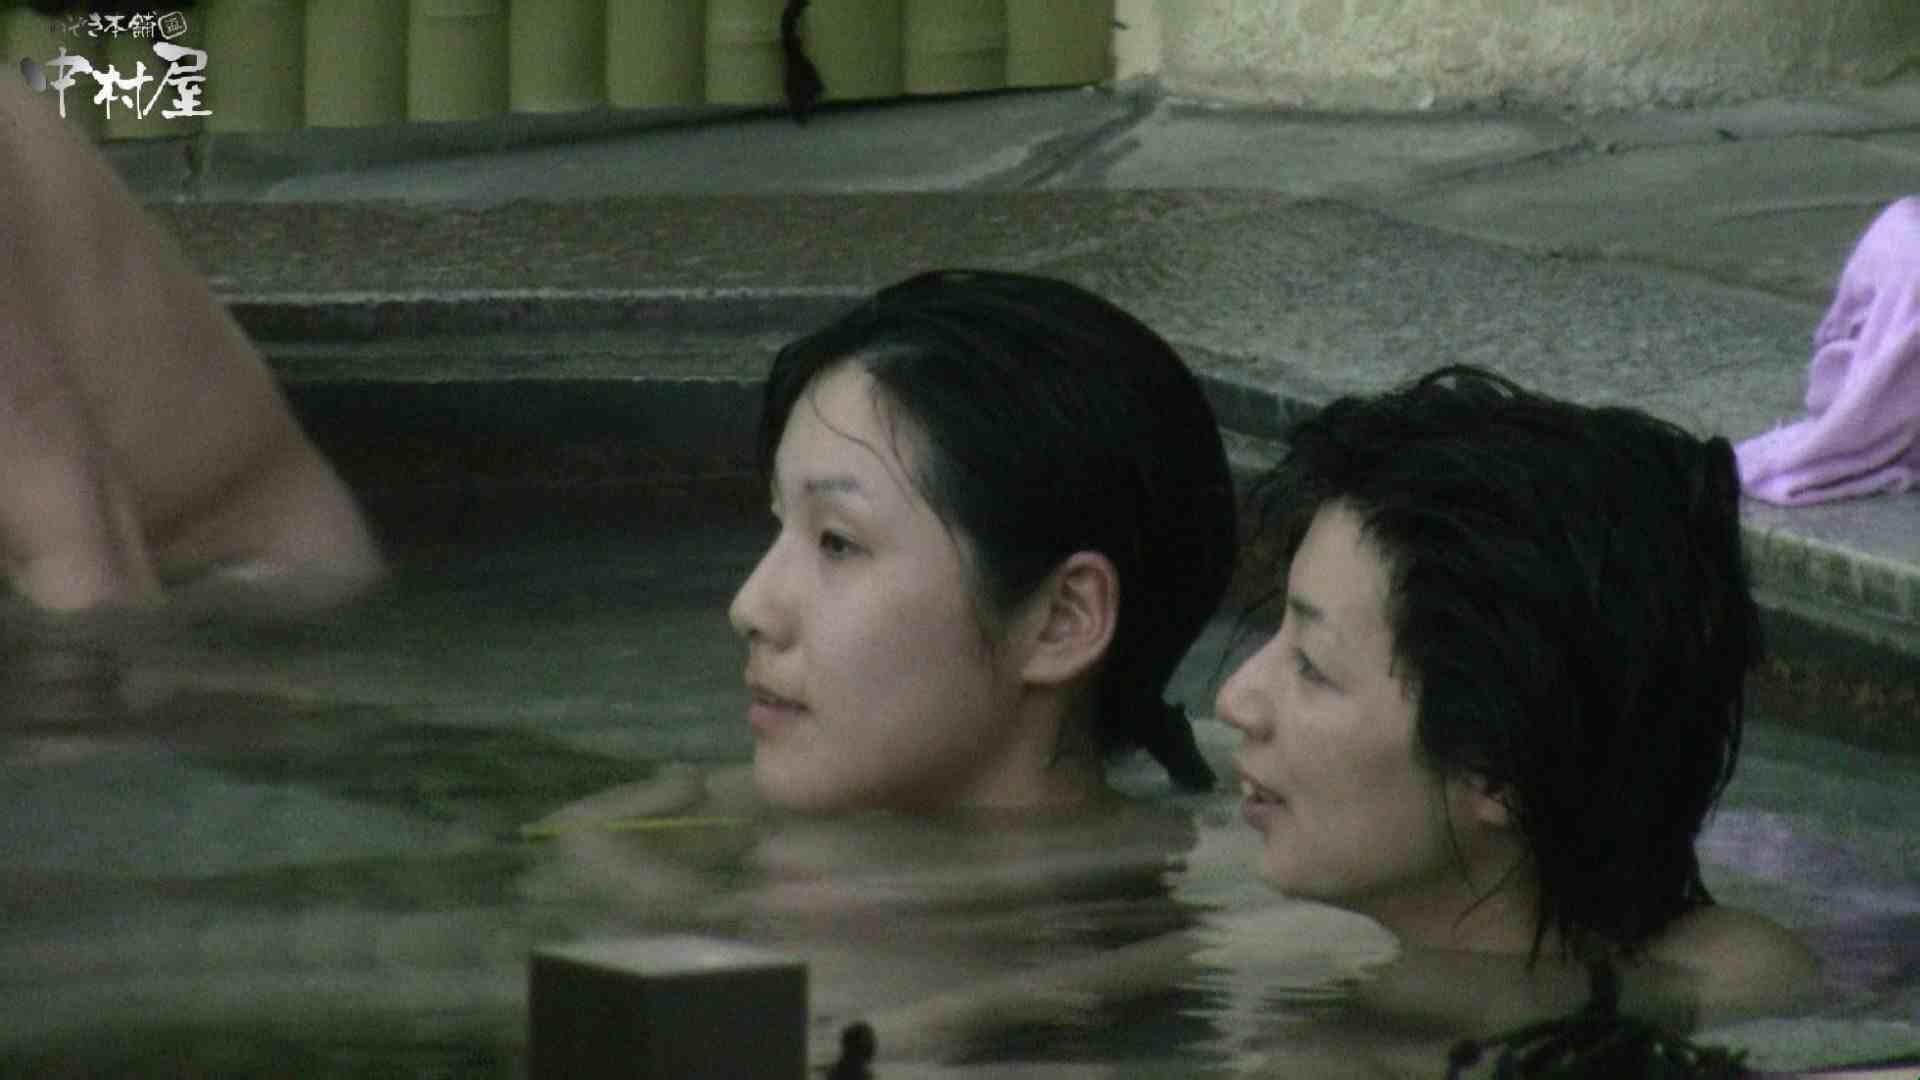 Aquaな露天風呂Vol.983 盗撮  23pic 5